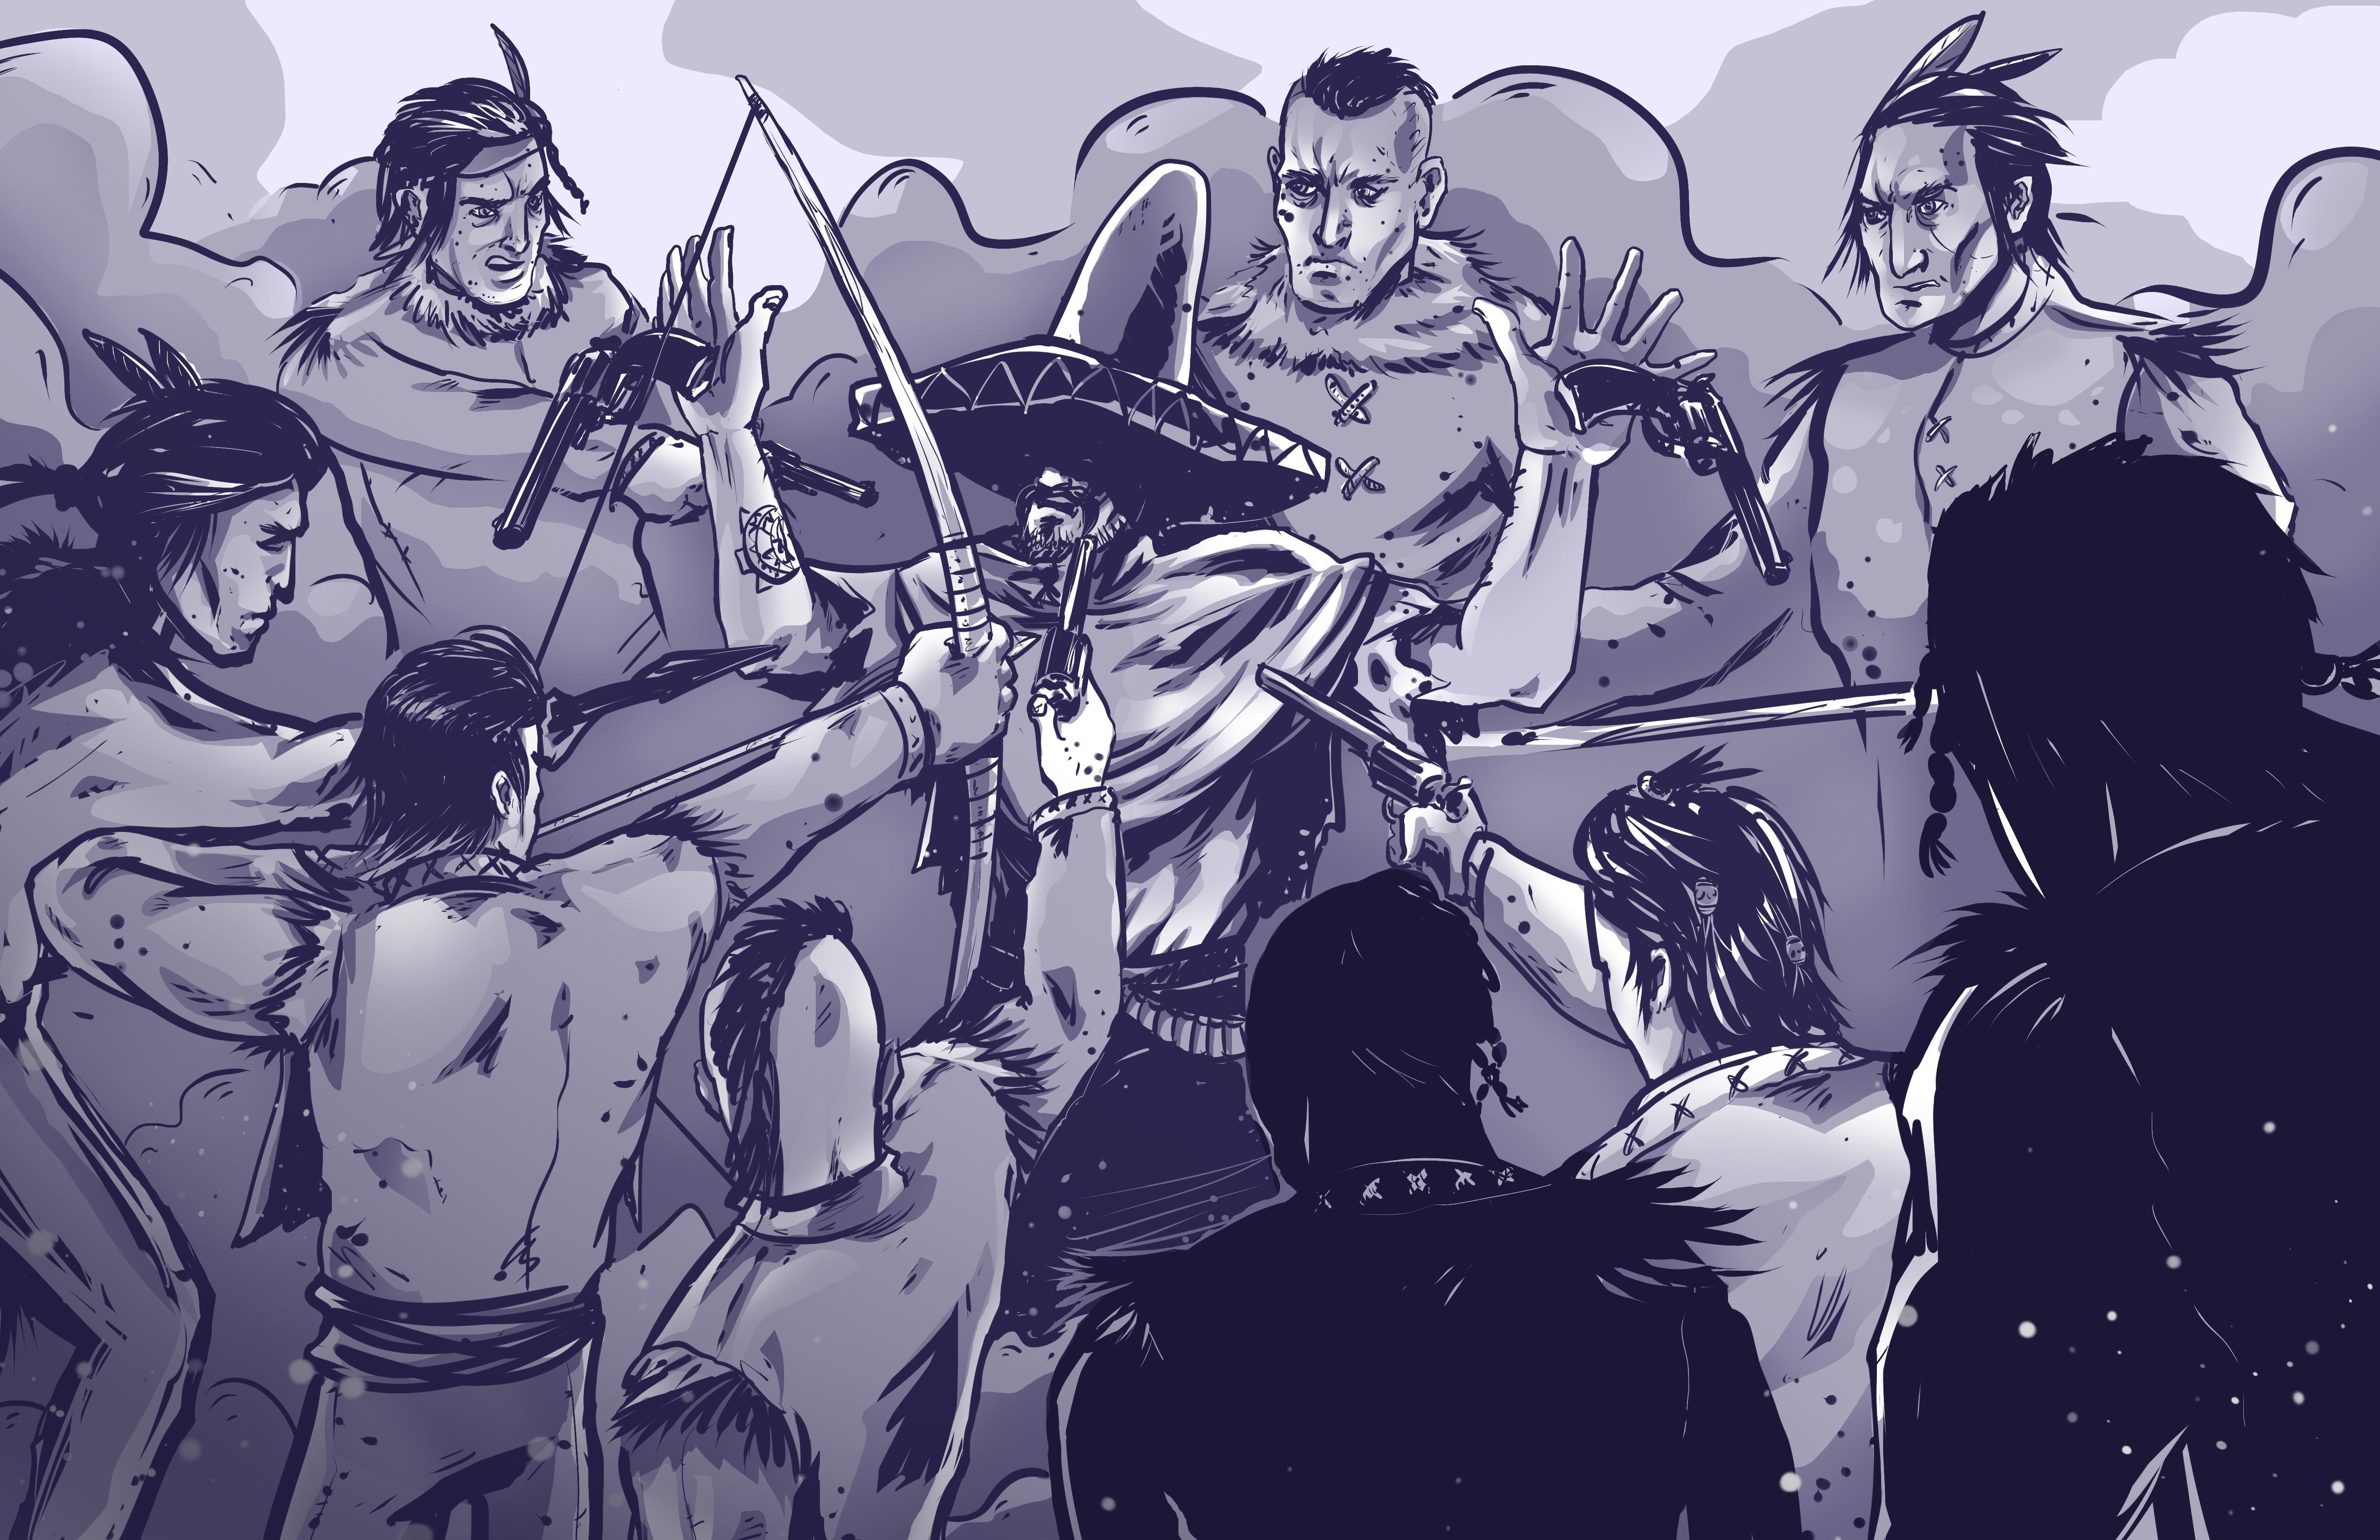 Somwhere on Wild West #12isbetterthan6 #12ibt6 #inkstainsgames #art #gamedev #indiegame #indiedev #indie #gamedesign #gaming #topdownshooter #tds #singleplayer #western #videogames #Steam #gamer #games #indiegames #indiegamedev #gamedevelopment #2d #2dart #illustration #illustrator #artist #artistic #graphicdesign #graphic #drawing #illustration